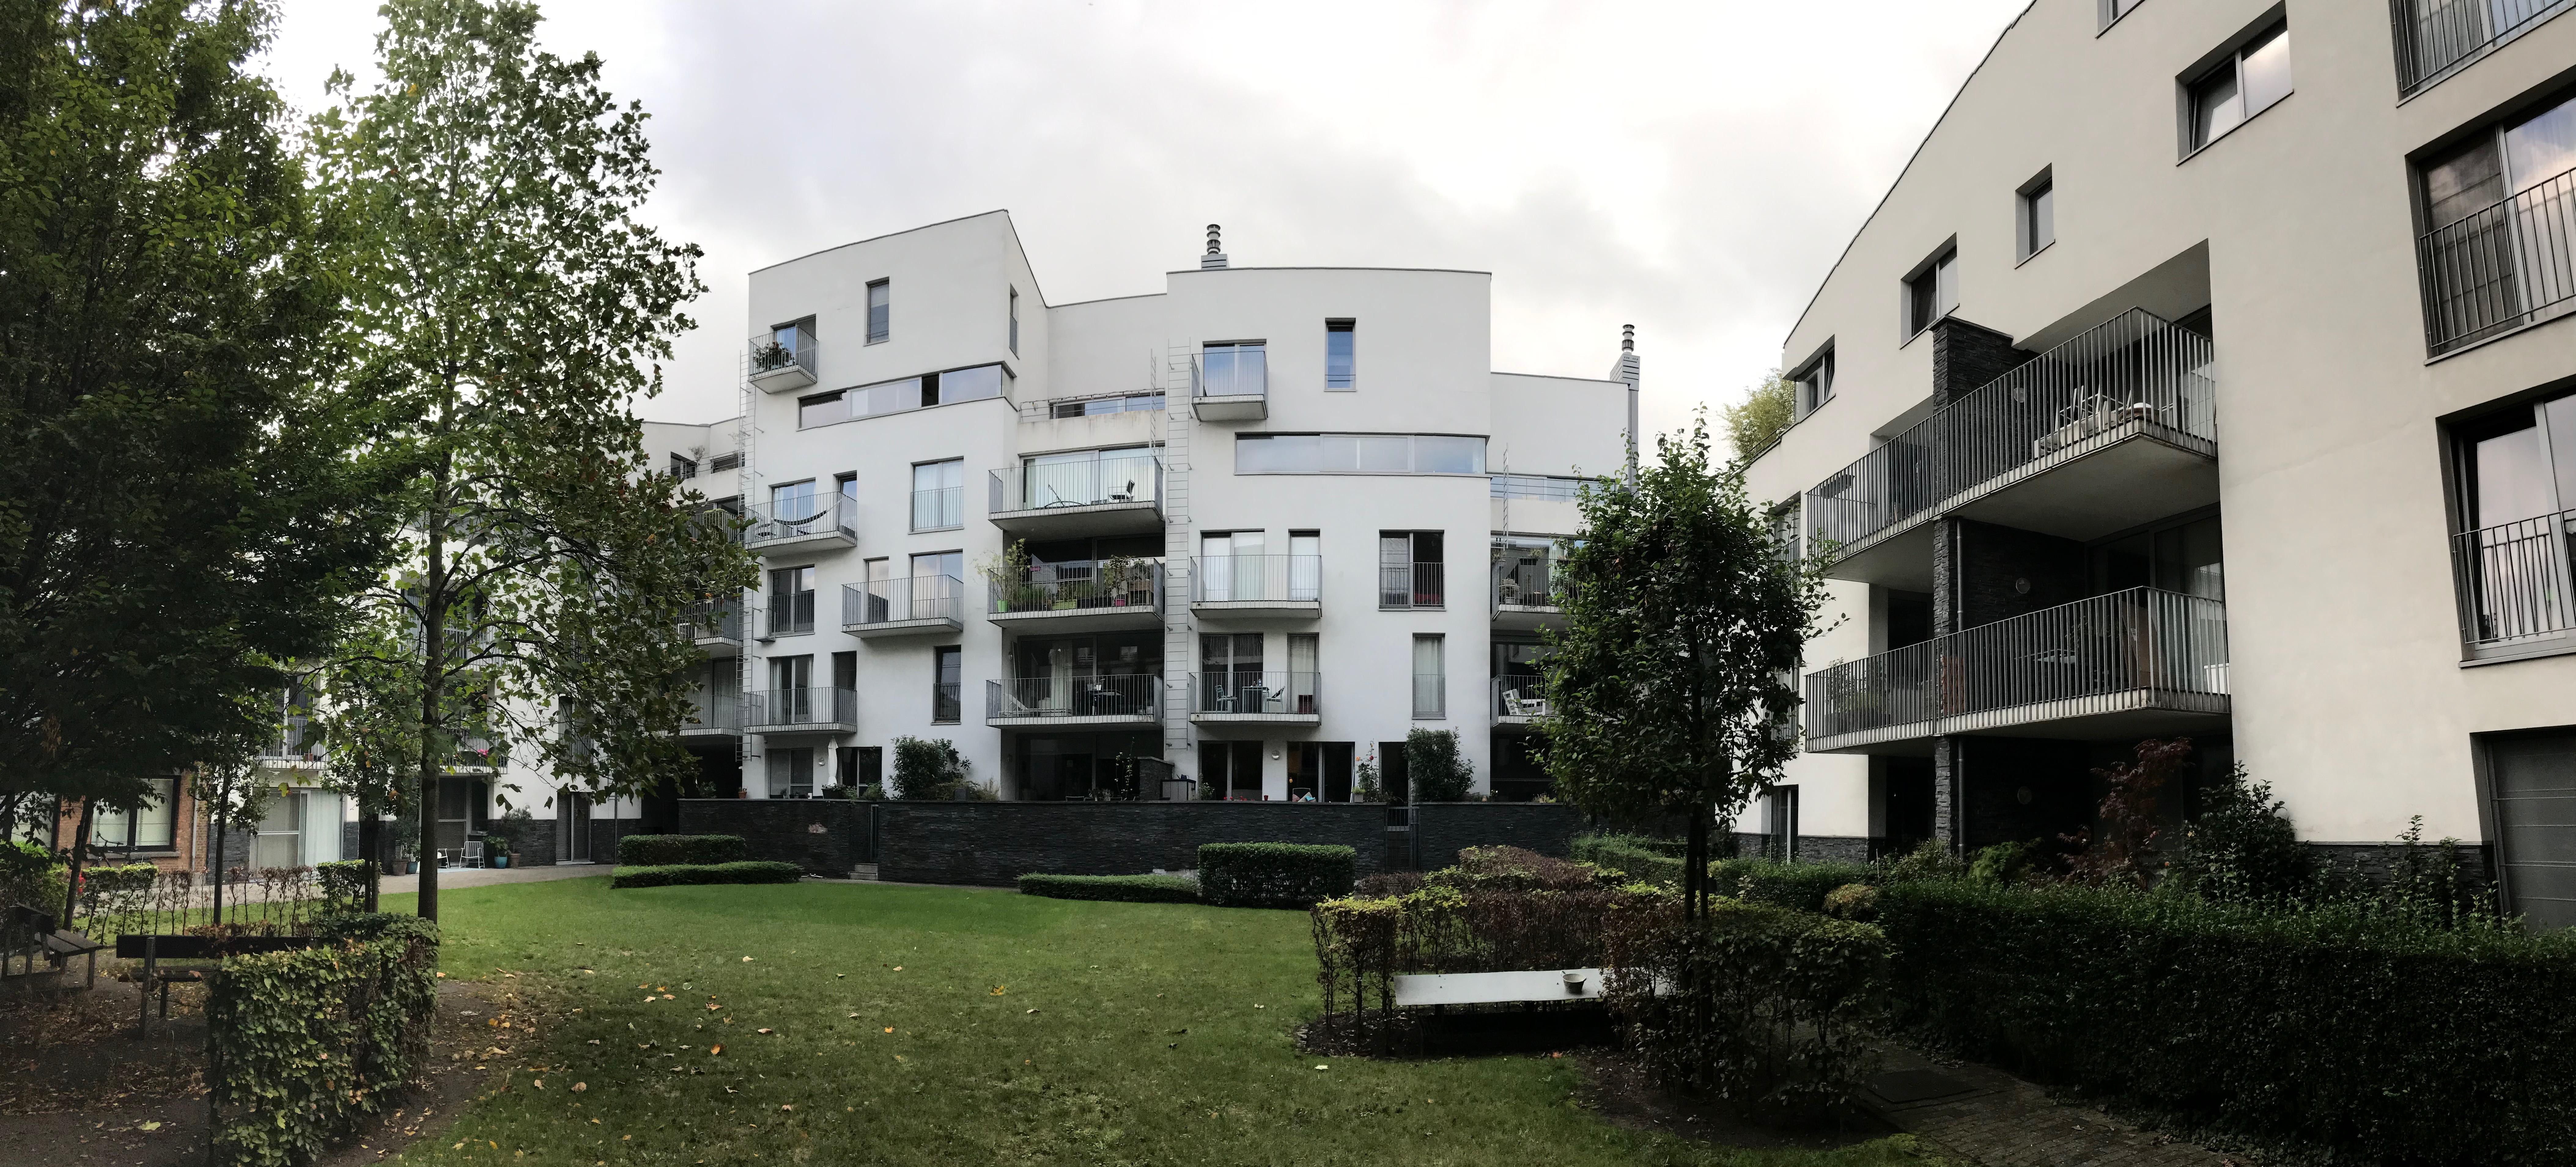 Academie - Syndicus Melior Beheer